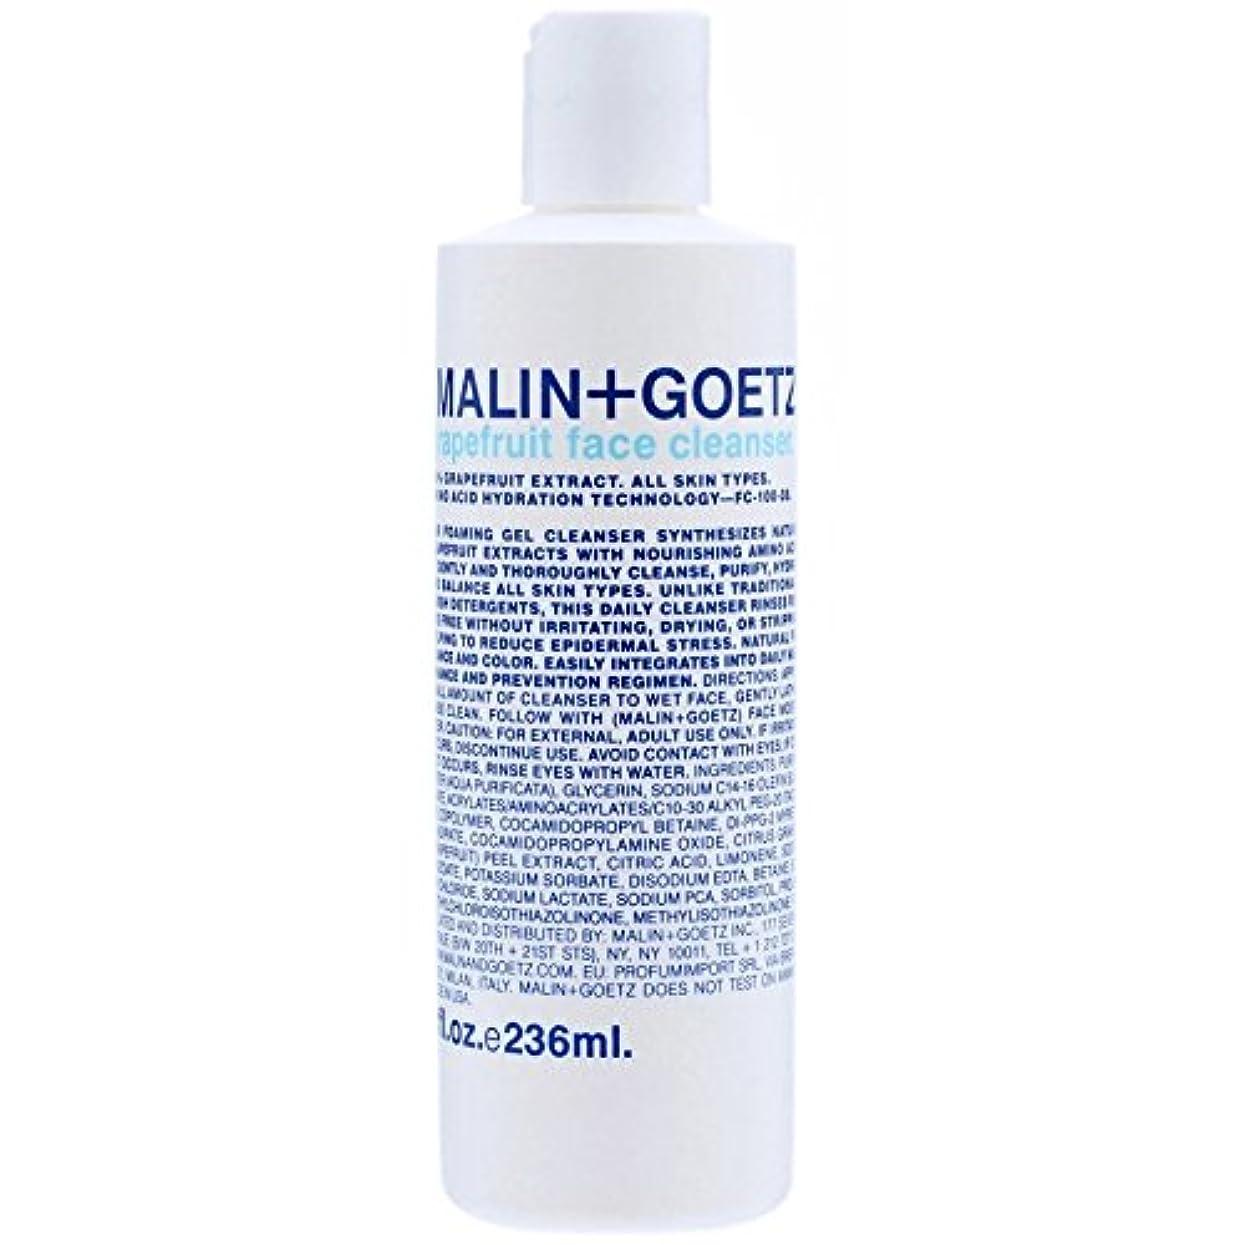 MALIN+GOETZ Grapefruit Face Cleanser - マリン+ゲッツグレープフルーツフェイスクレンザー [並行輸入品]